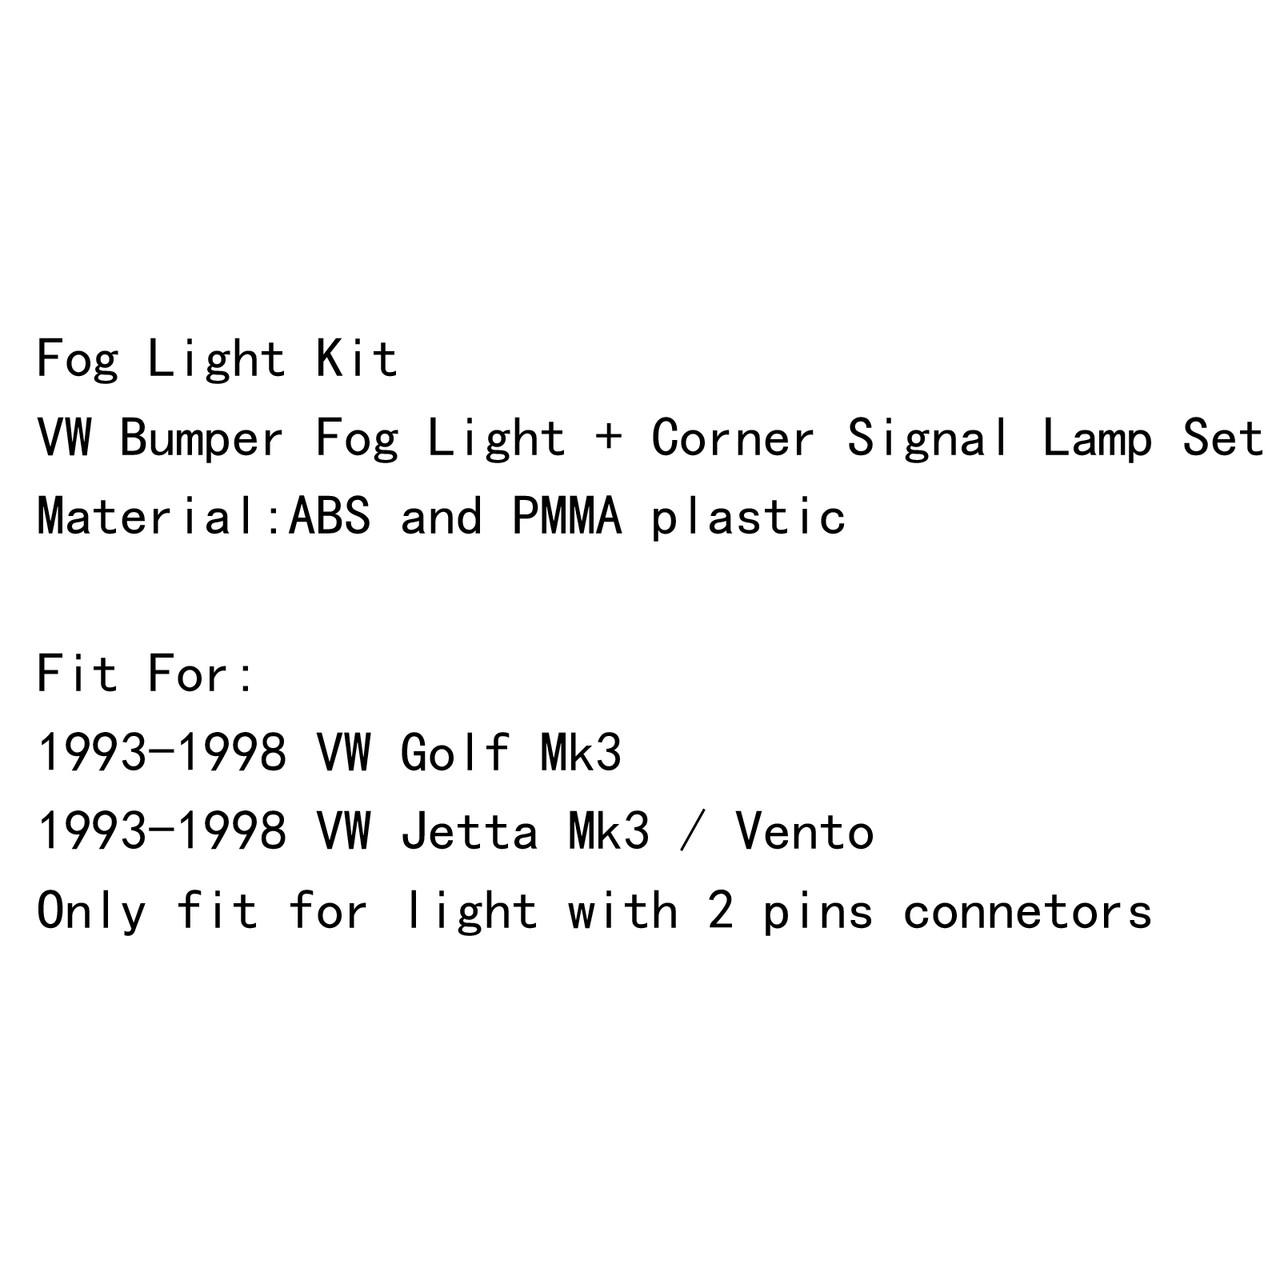 Front Smoke Lens Bumper Fog Light &Signal Lamp Kit VW Jetta Golf MK3 (93-98) Smoke